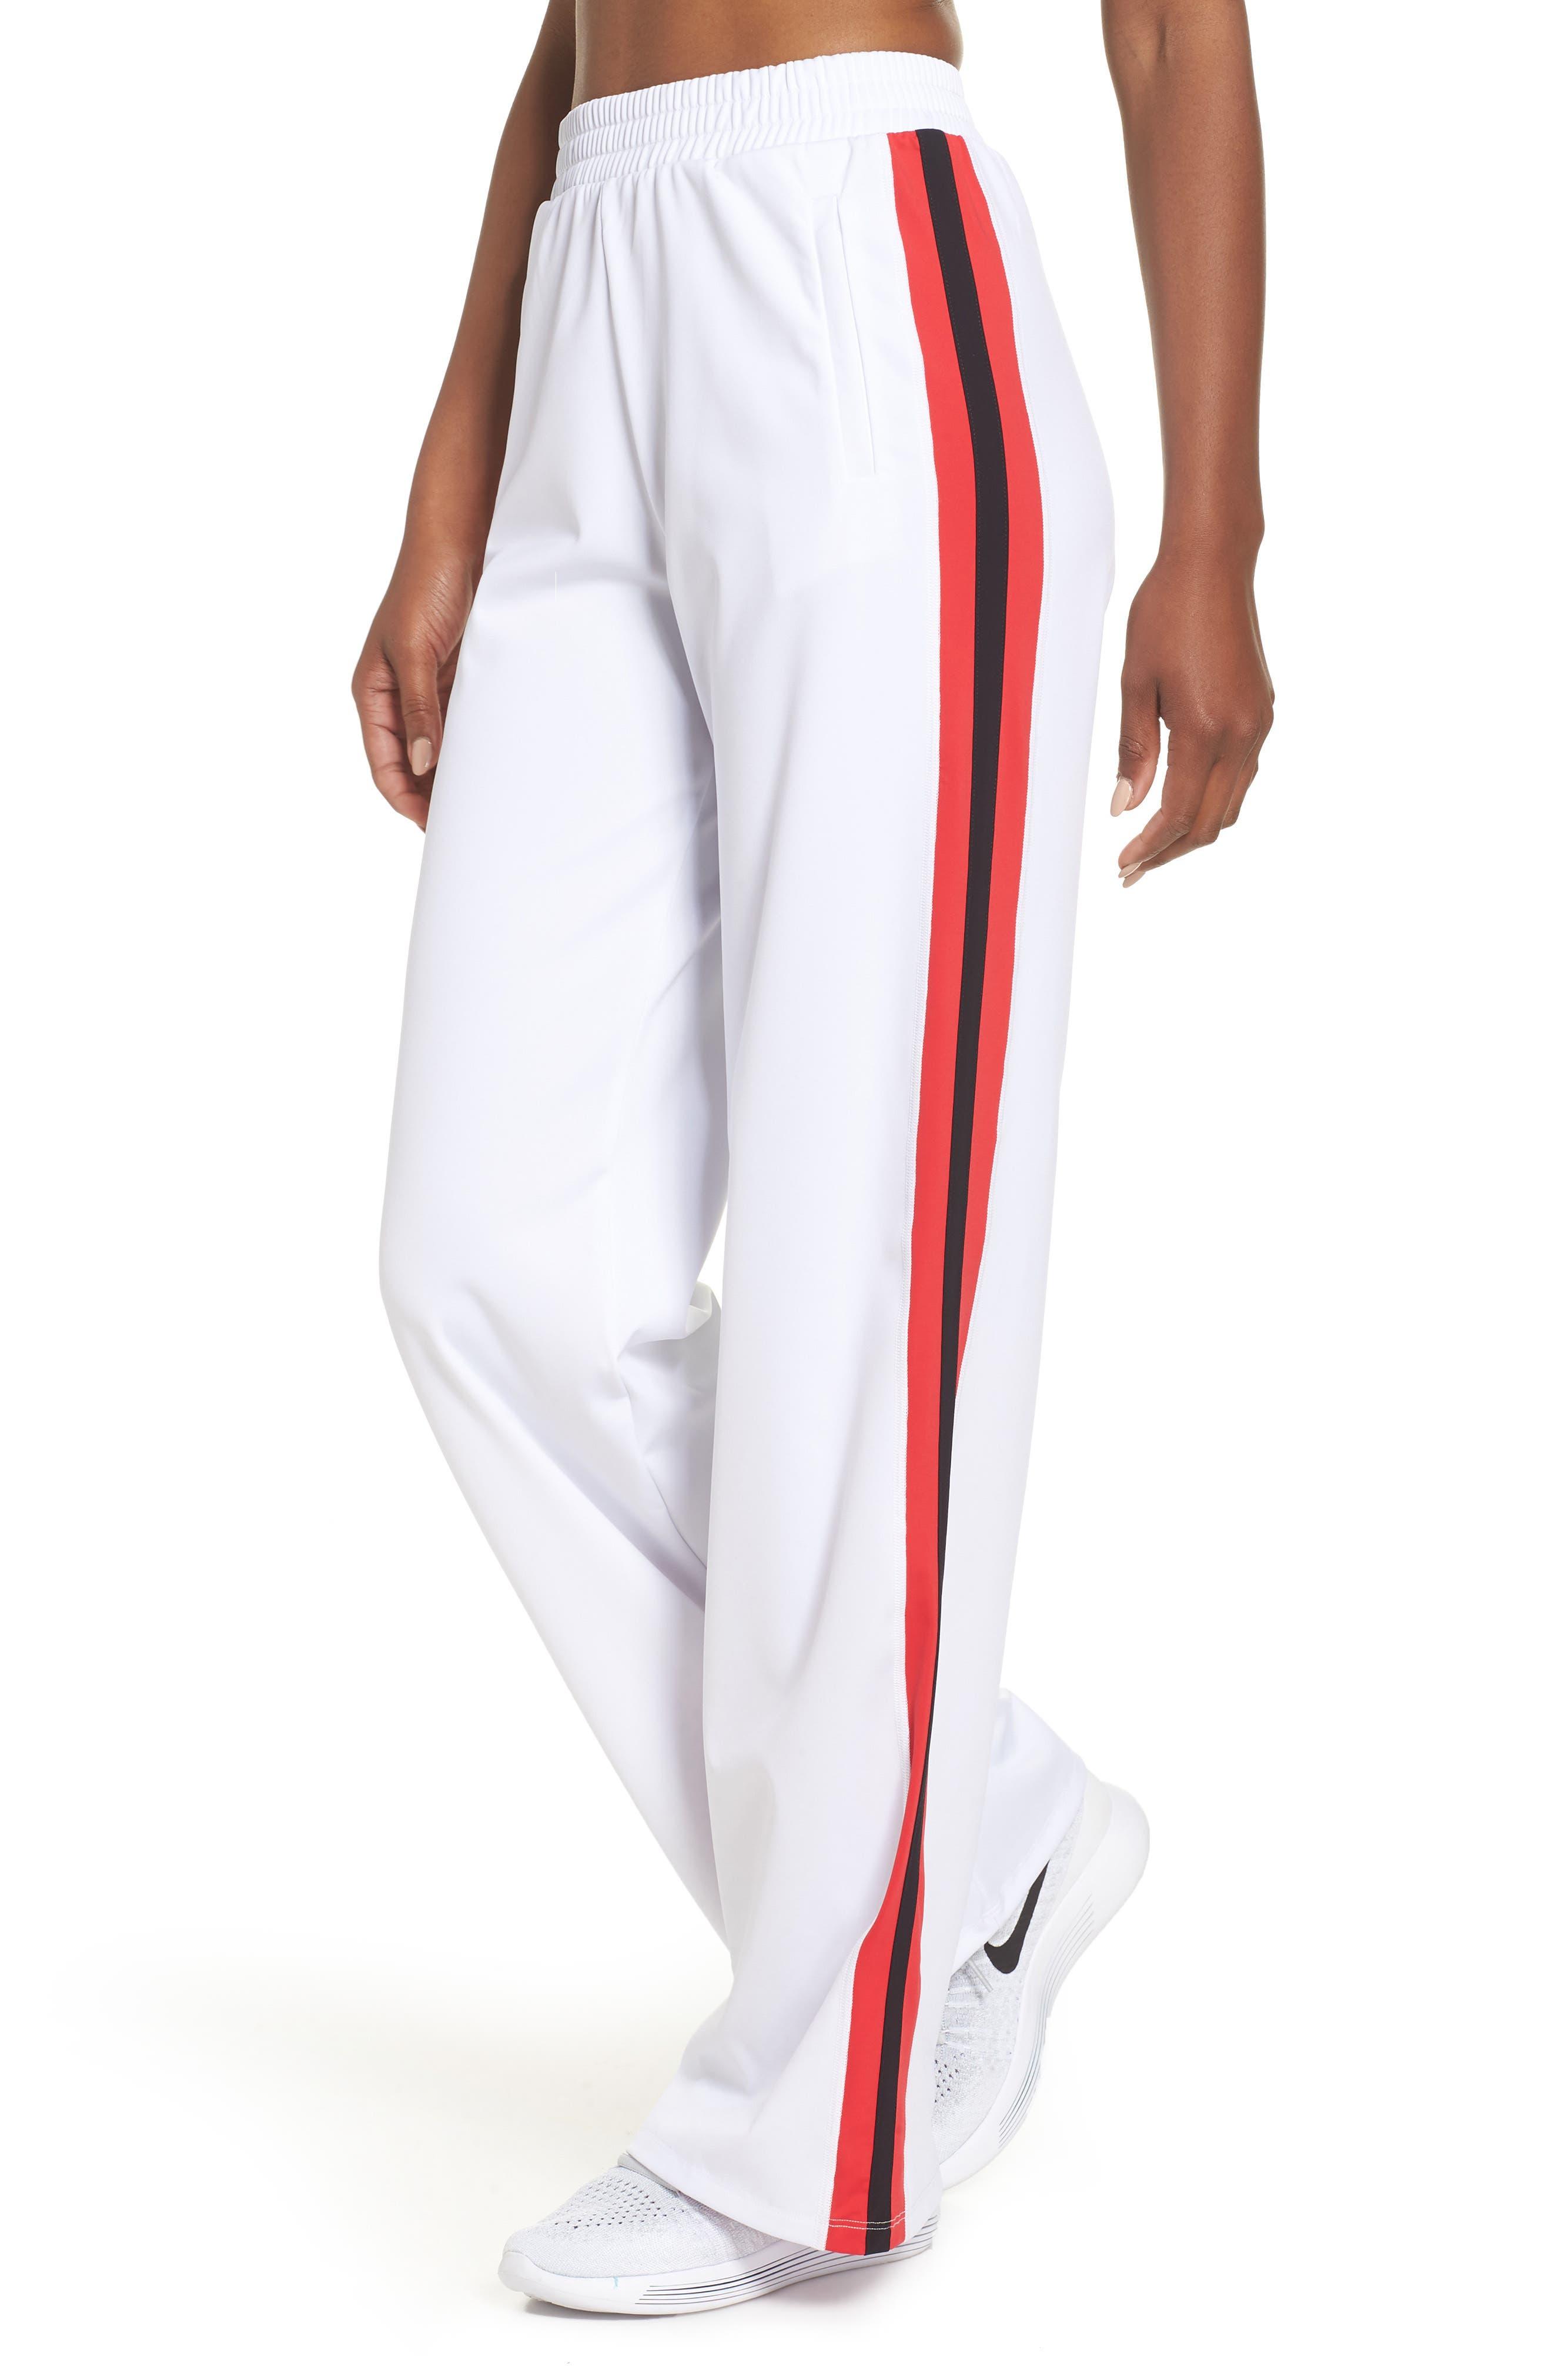 Wide Leg Track Pants,                             Main thumbnail 1, color,                             White/ Red/ Black